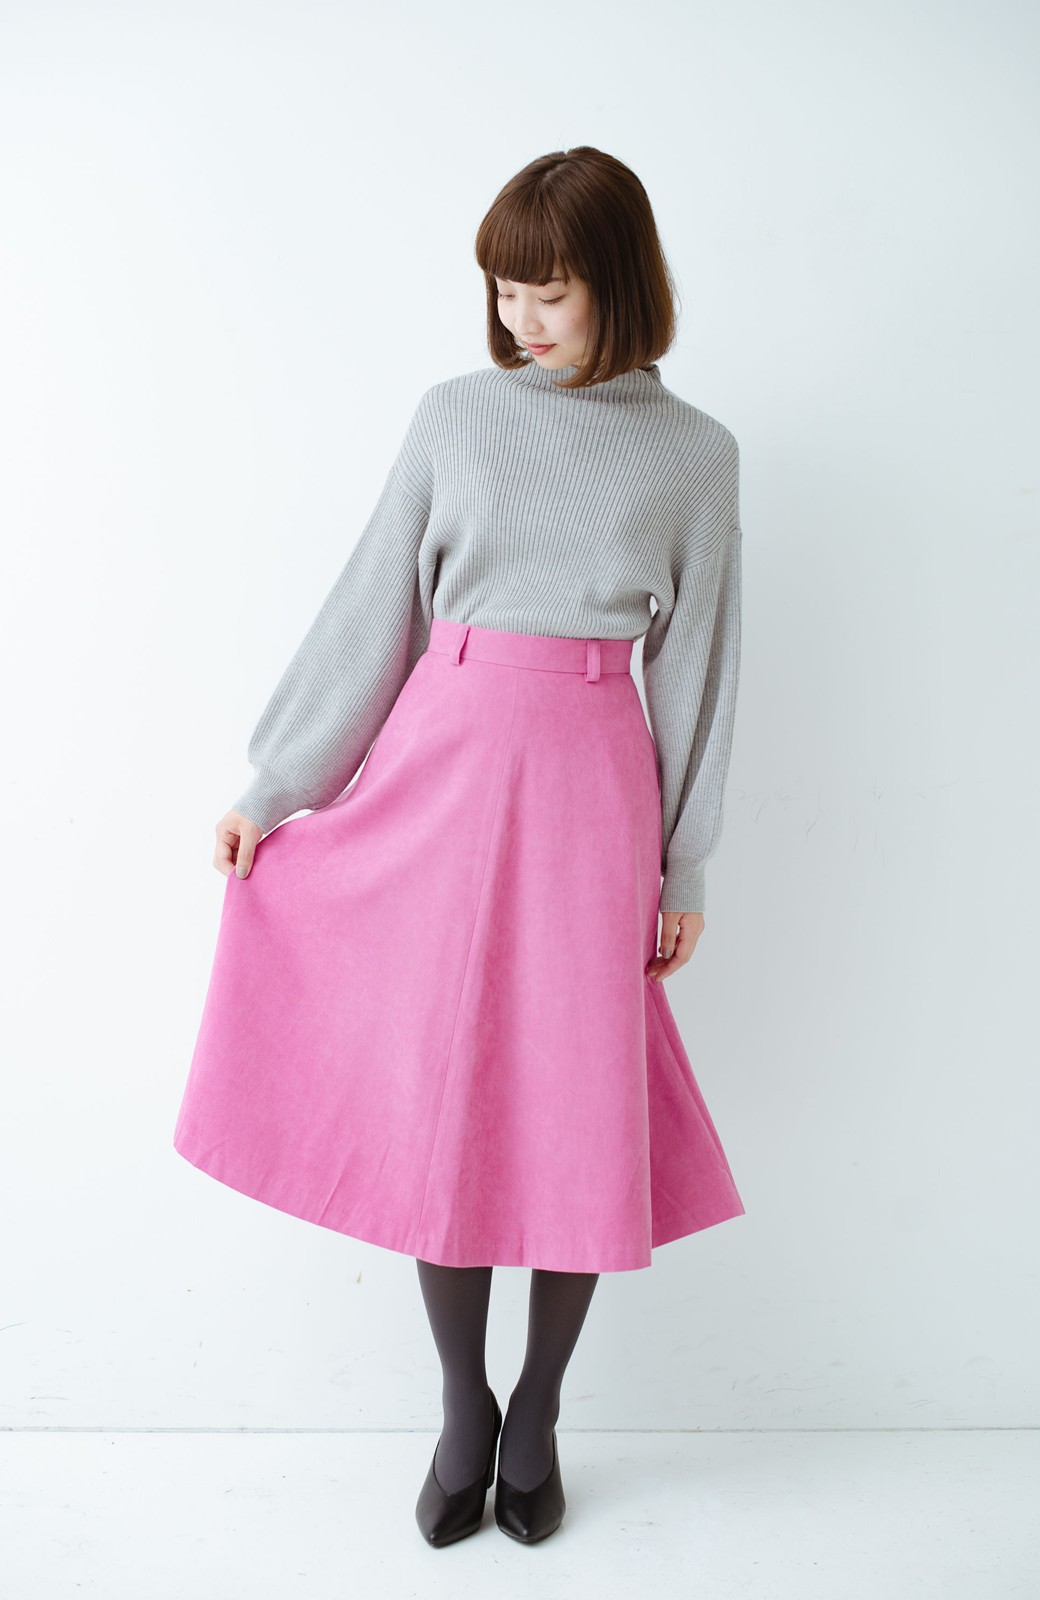 haco! 女っぽく上品に見える フレアースカート by que made me <ピンク>の商品写真9